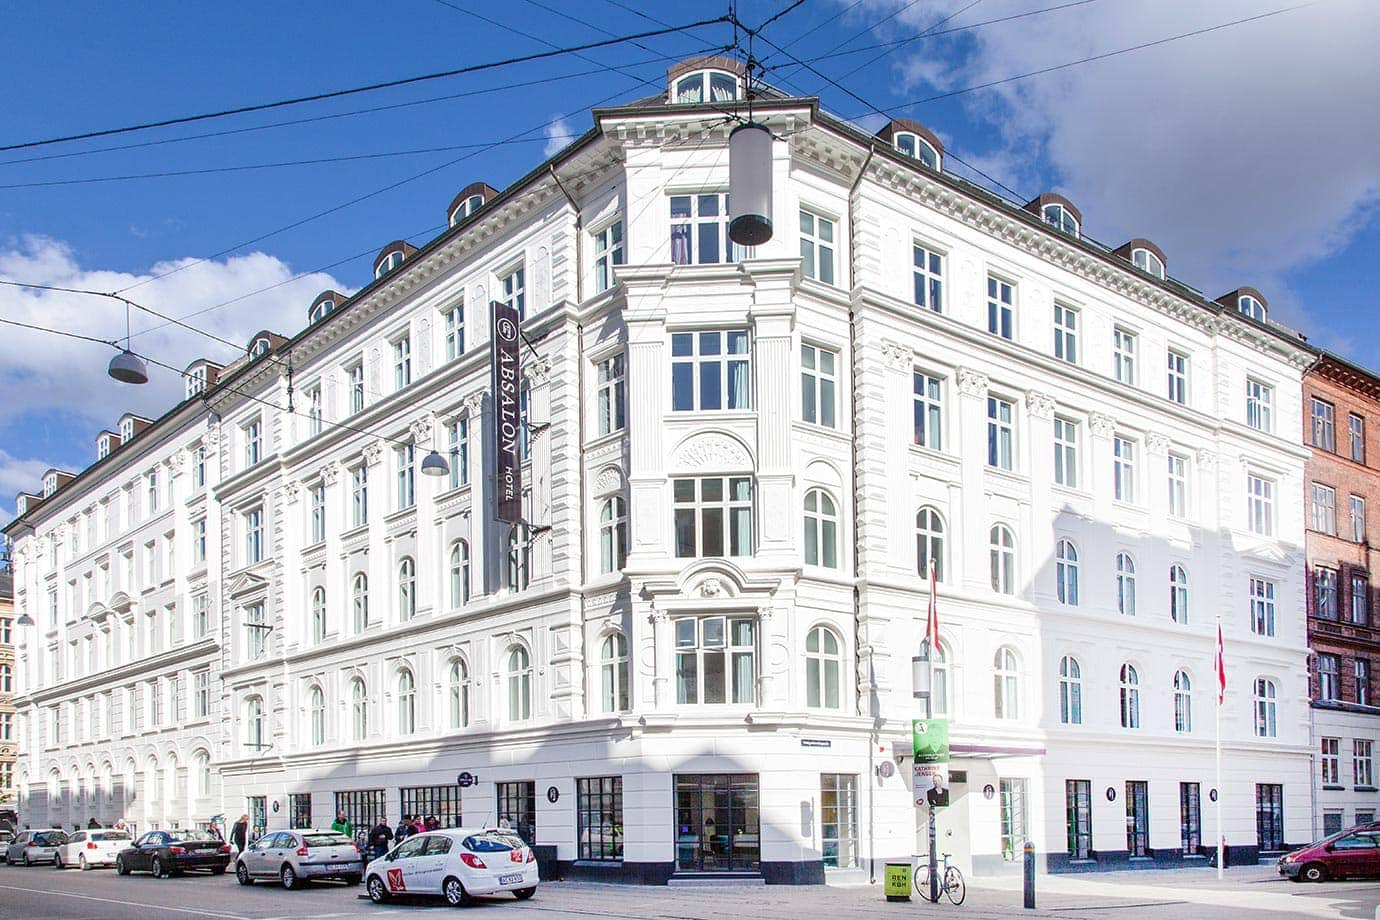 Hotel Review: Absalon Hotel, Copenhagen